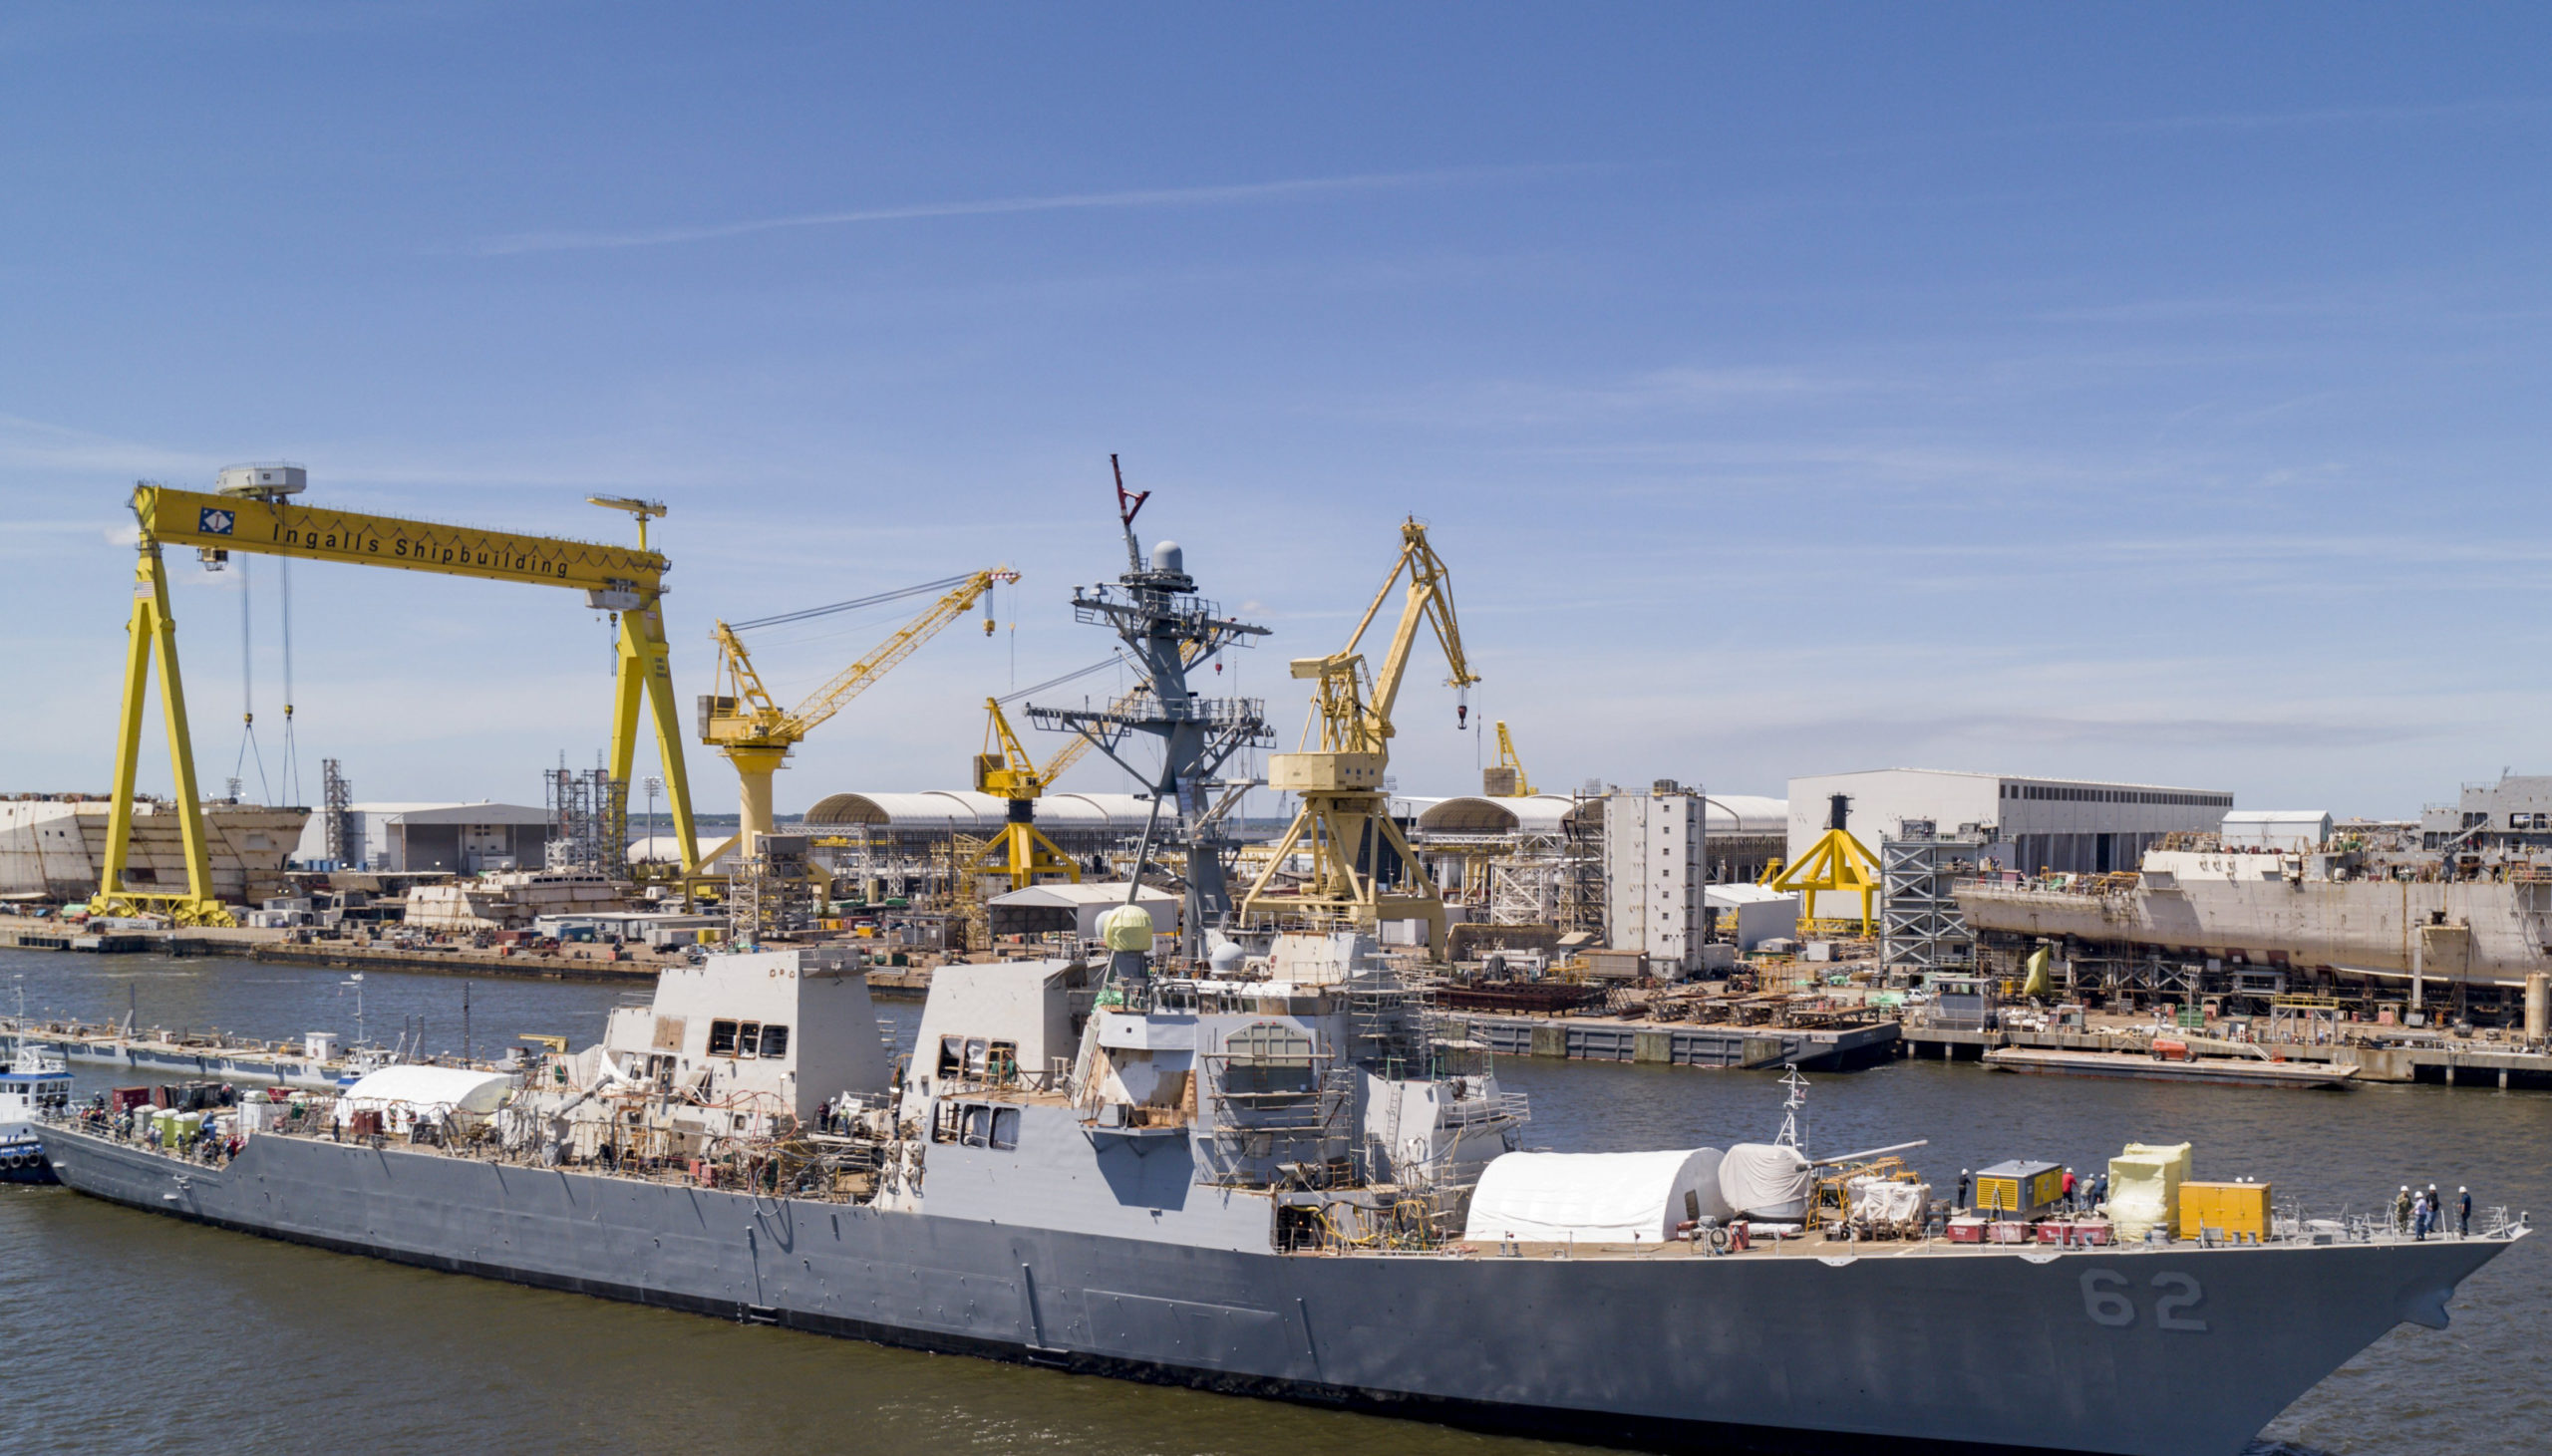 Lack of U.S. Warship Repair Capacity Worrying Navy